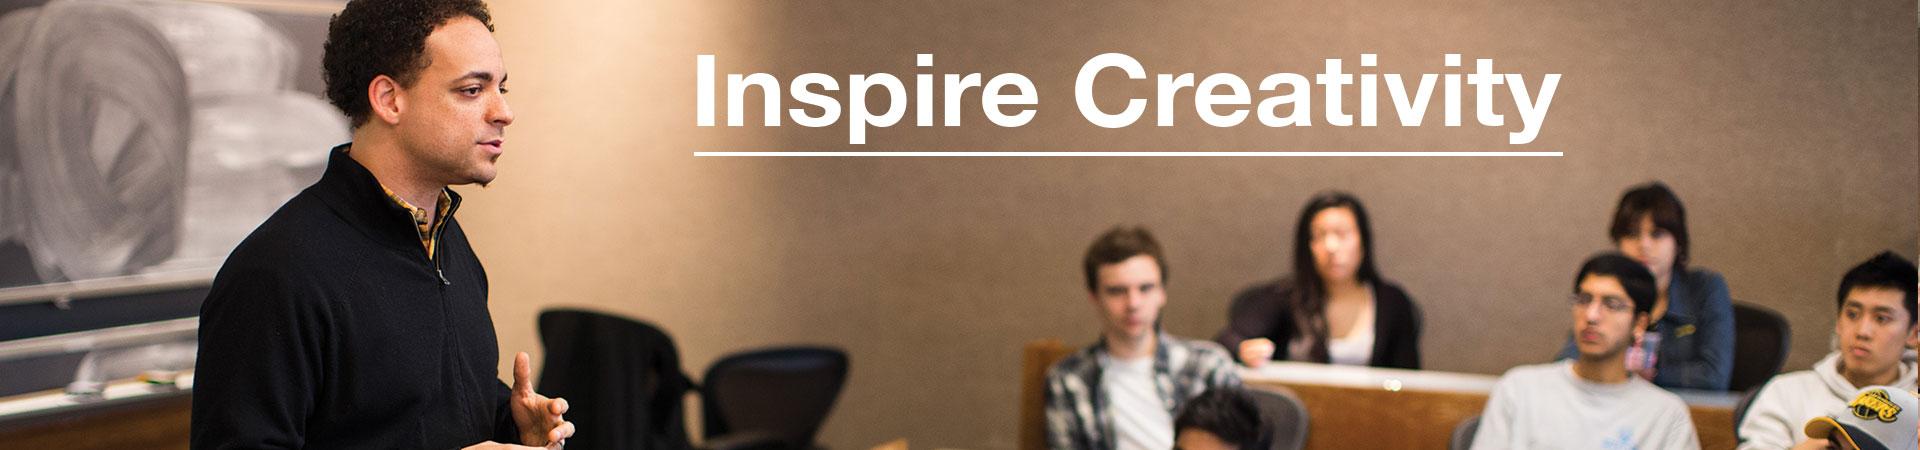 Inspire Creativity